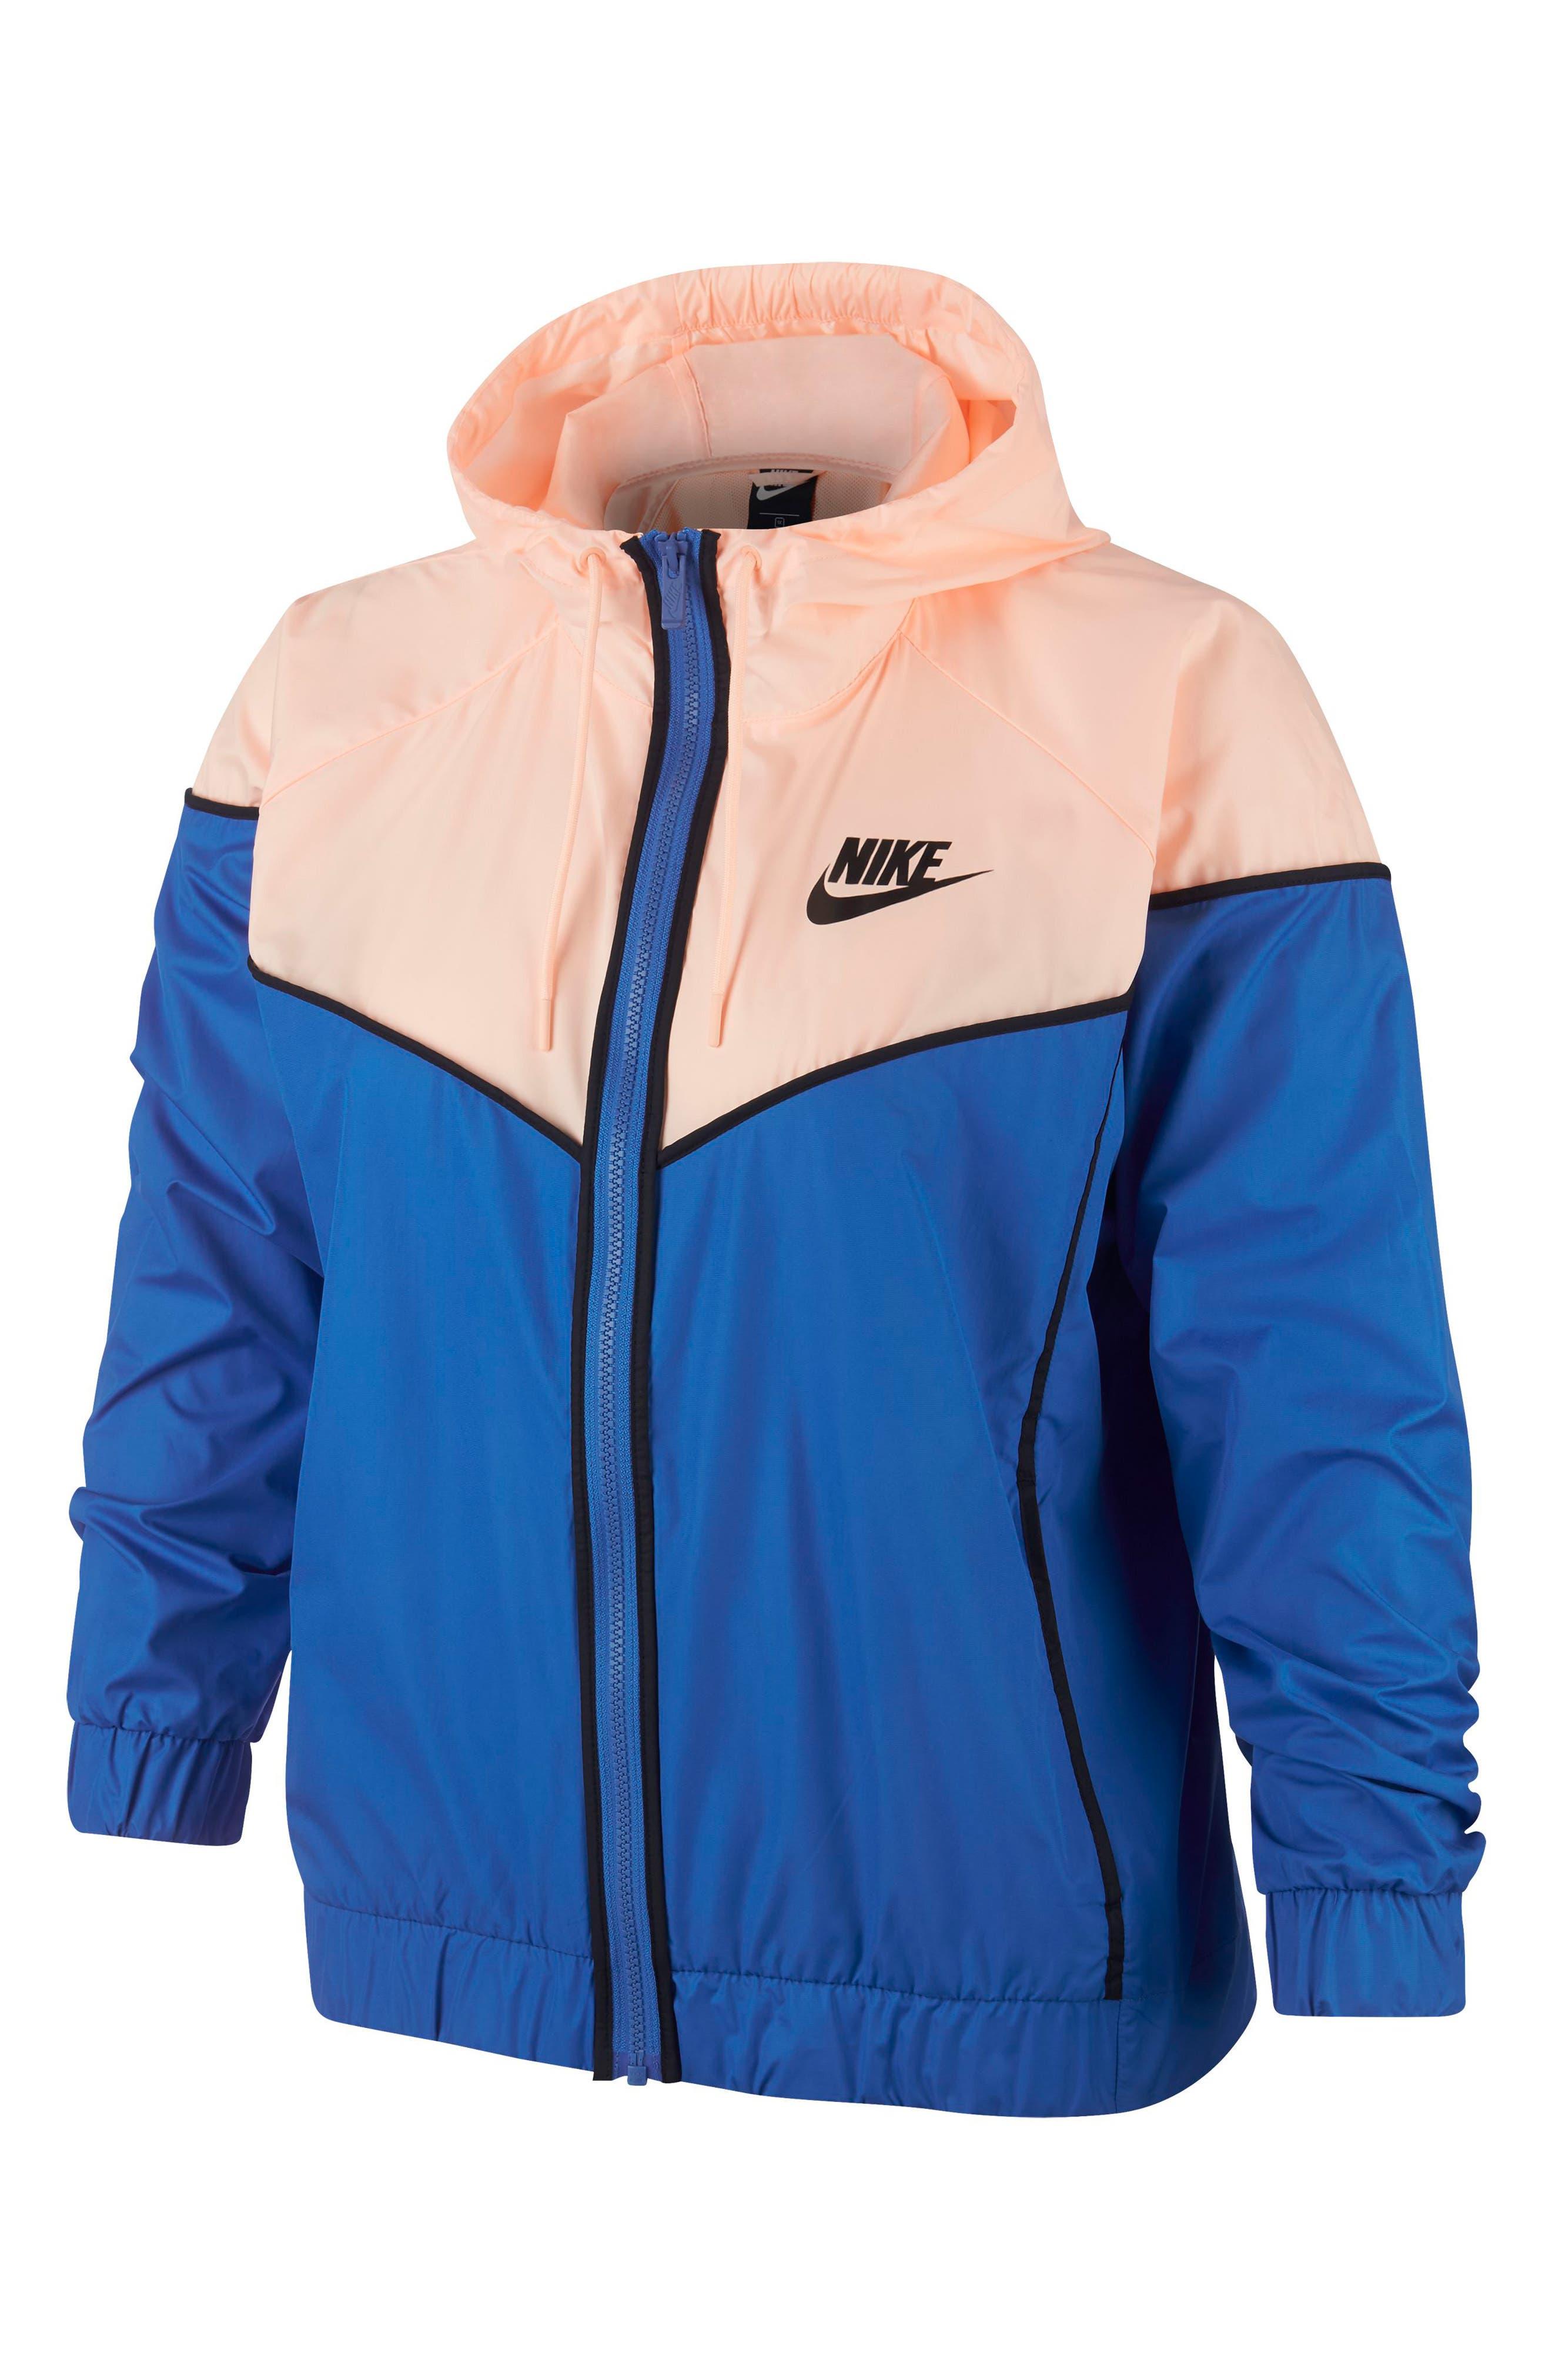 Sportswear Windrunner Jacket,                         Main,                         color, SIGNAL BLUE/ CRIMSON TINT